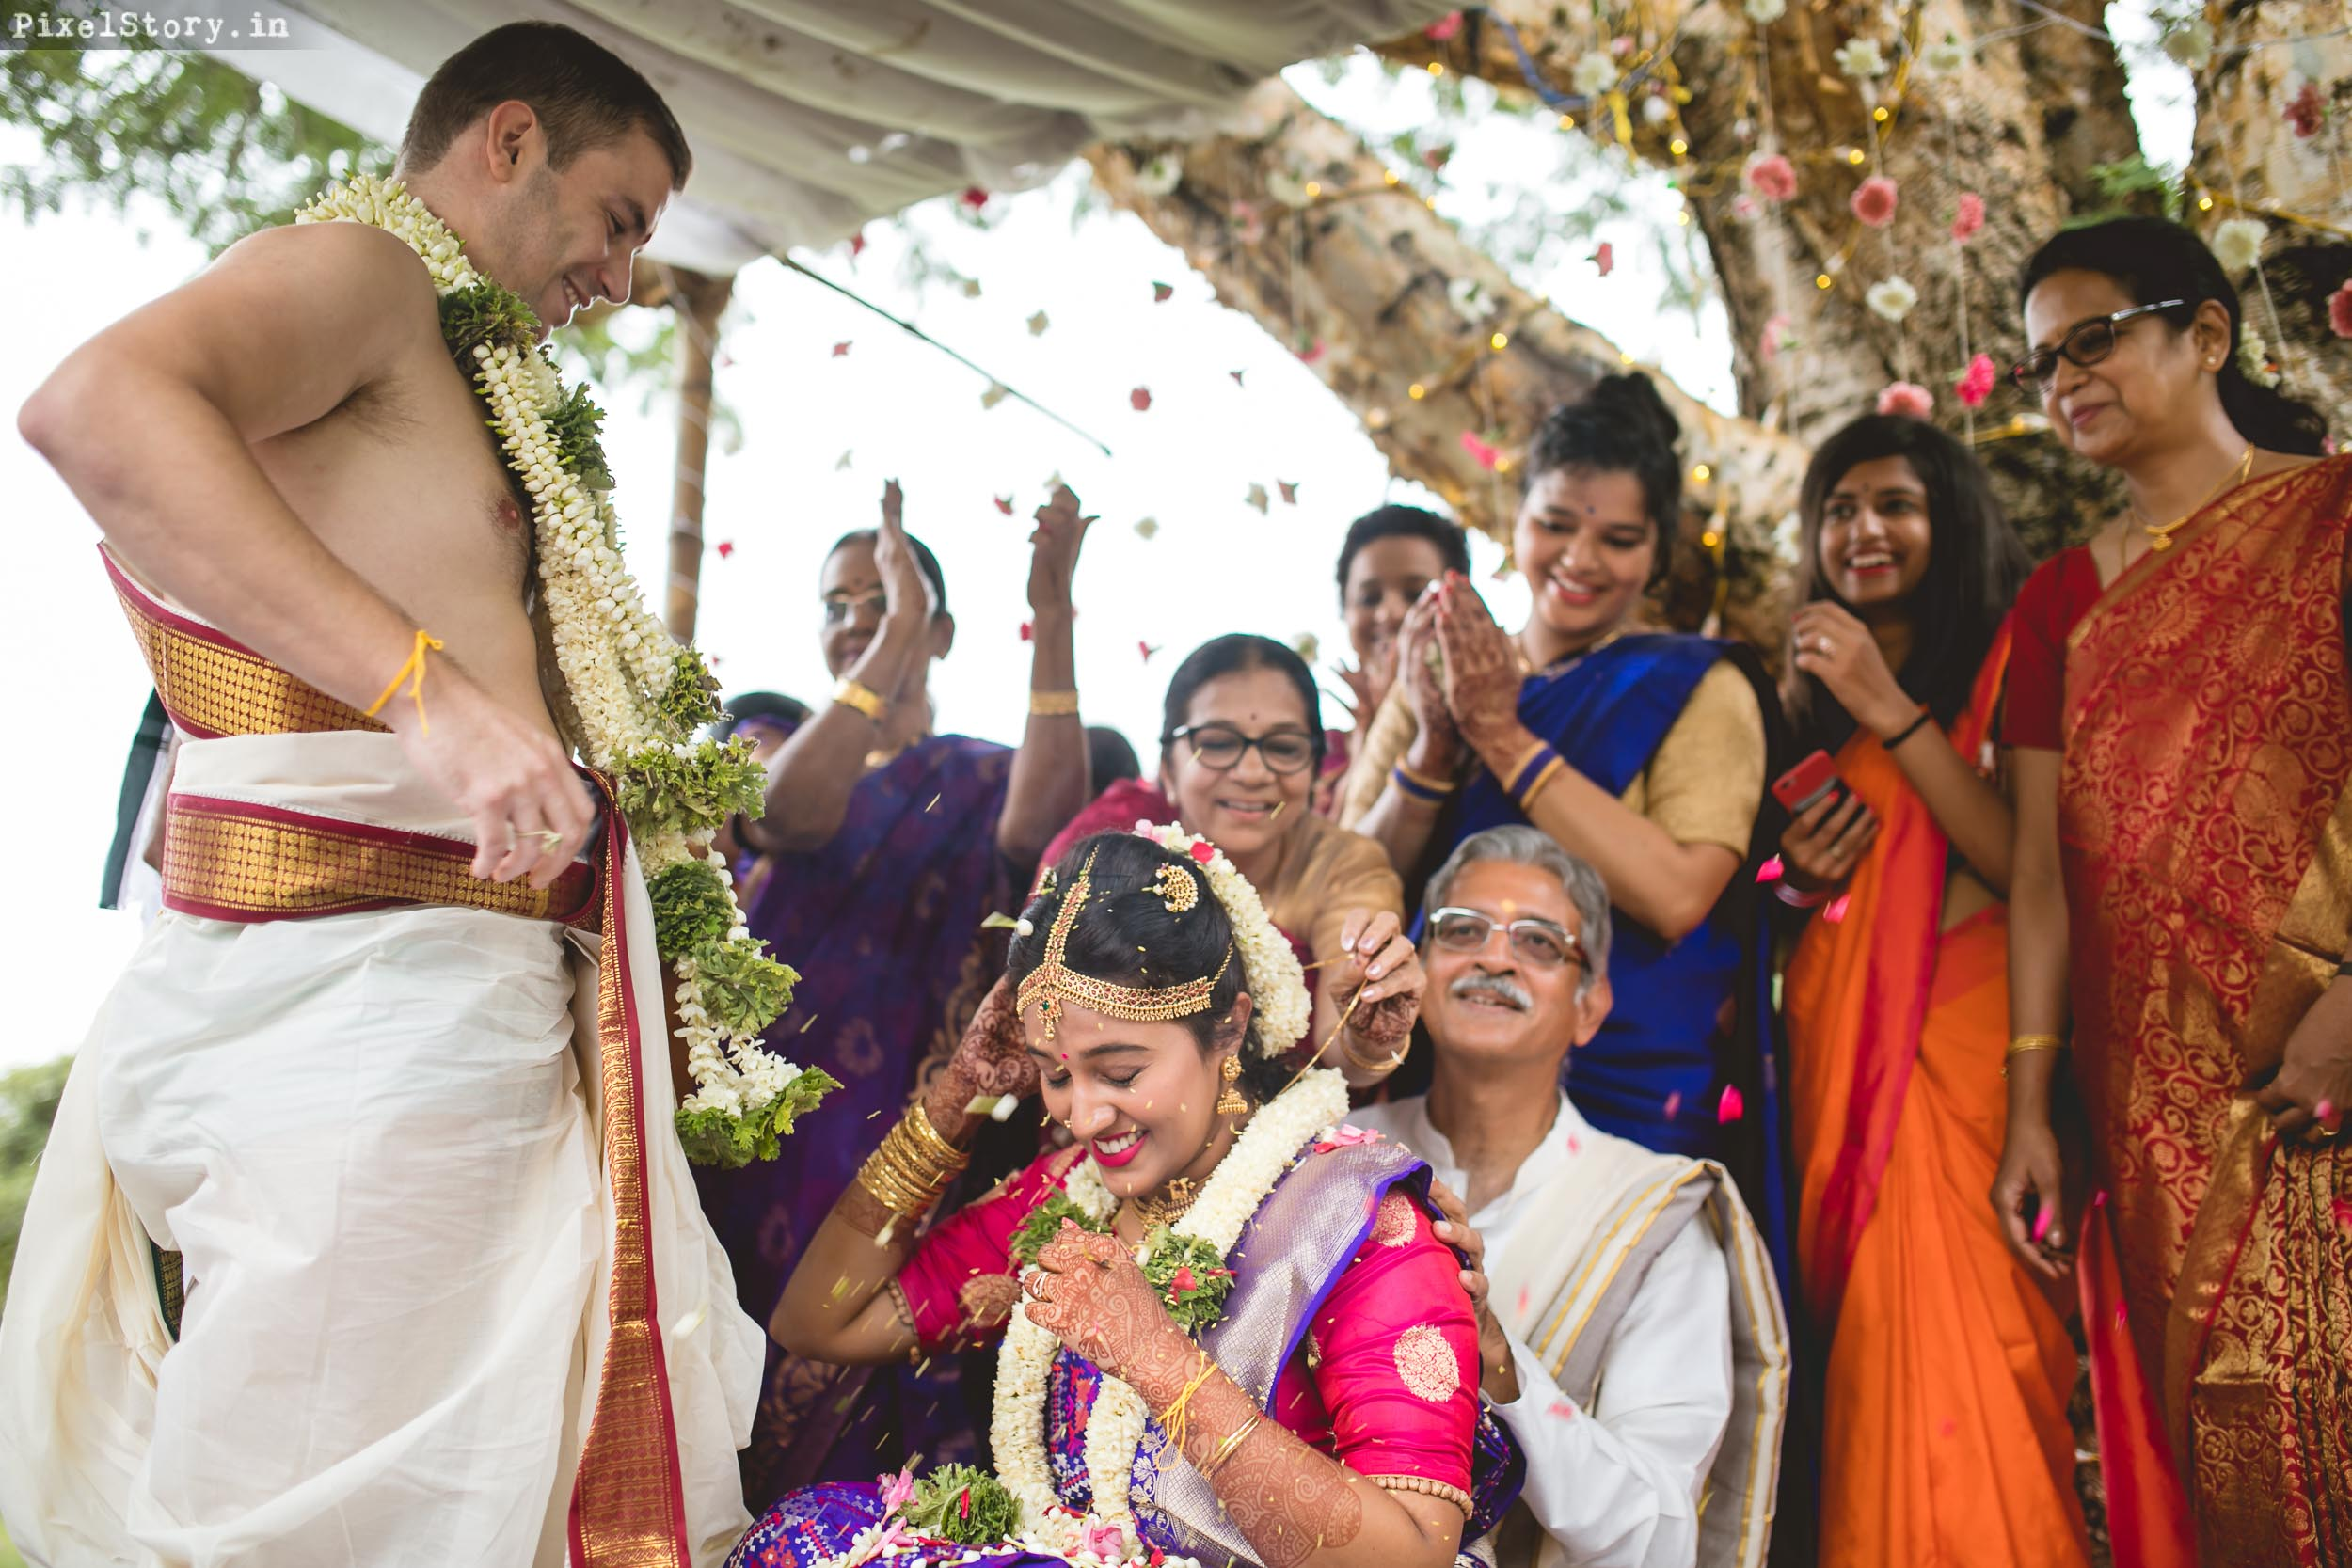 PixelStory-Jungle-Wedding-Photographer-Masinagudi-Indo-French066.jpg